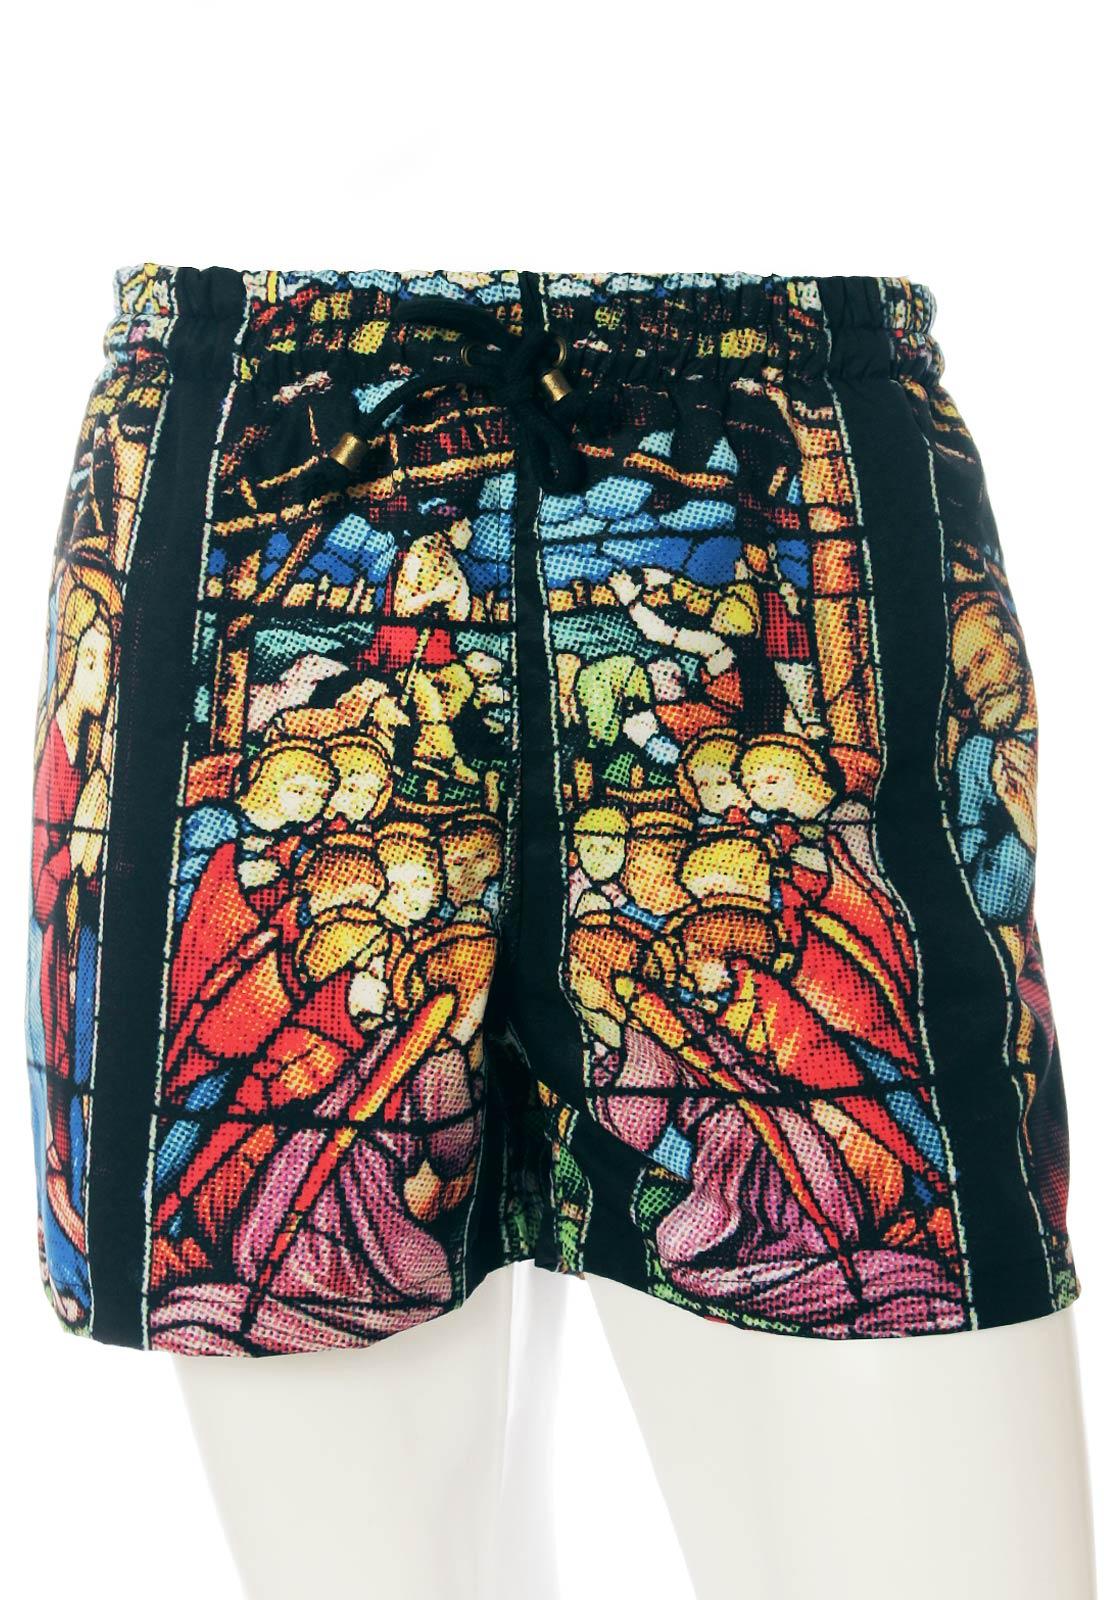 Shorts Estampado Sem Gênero Vitral Religioso Preto